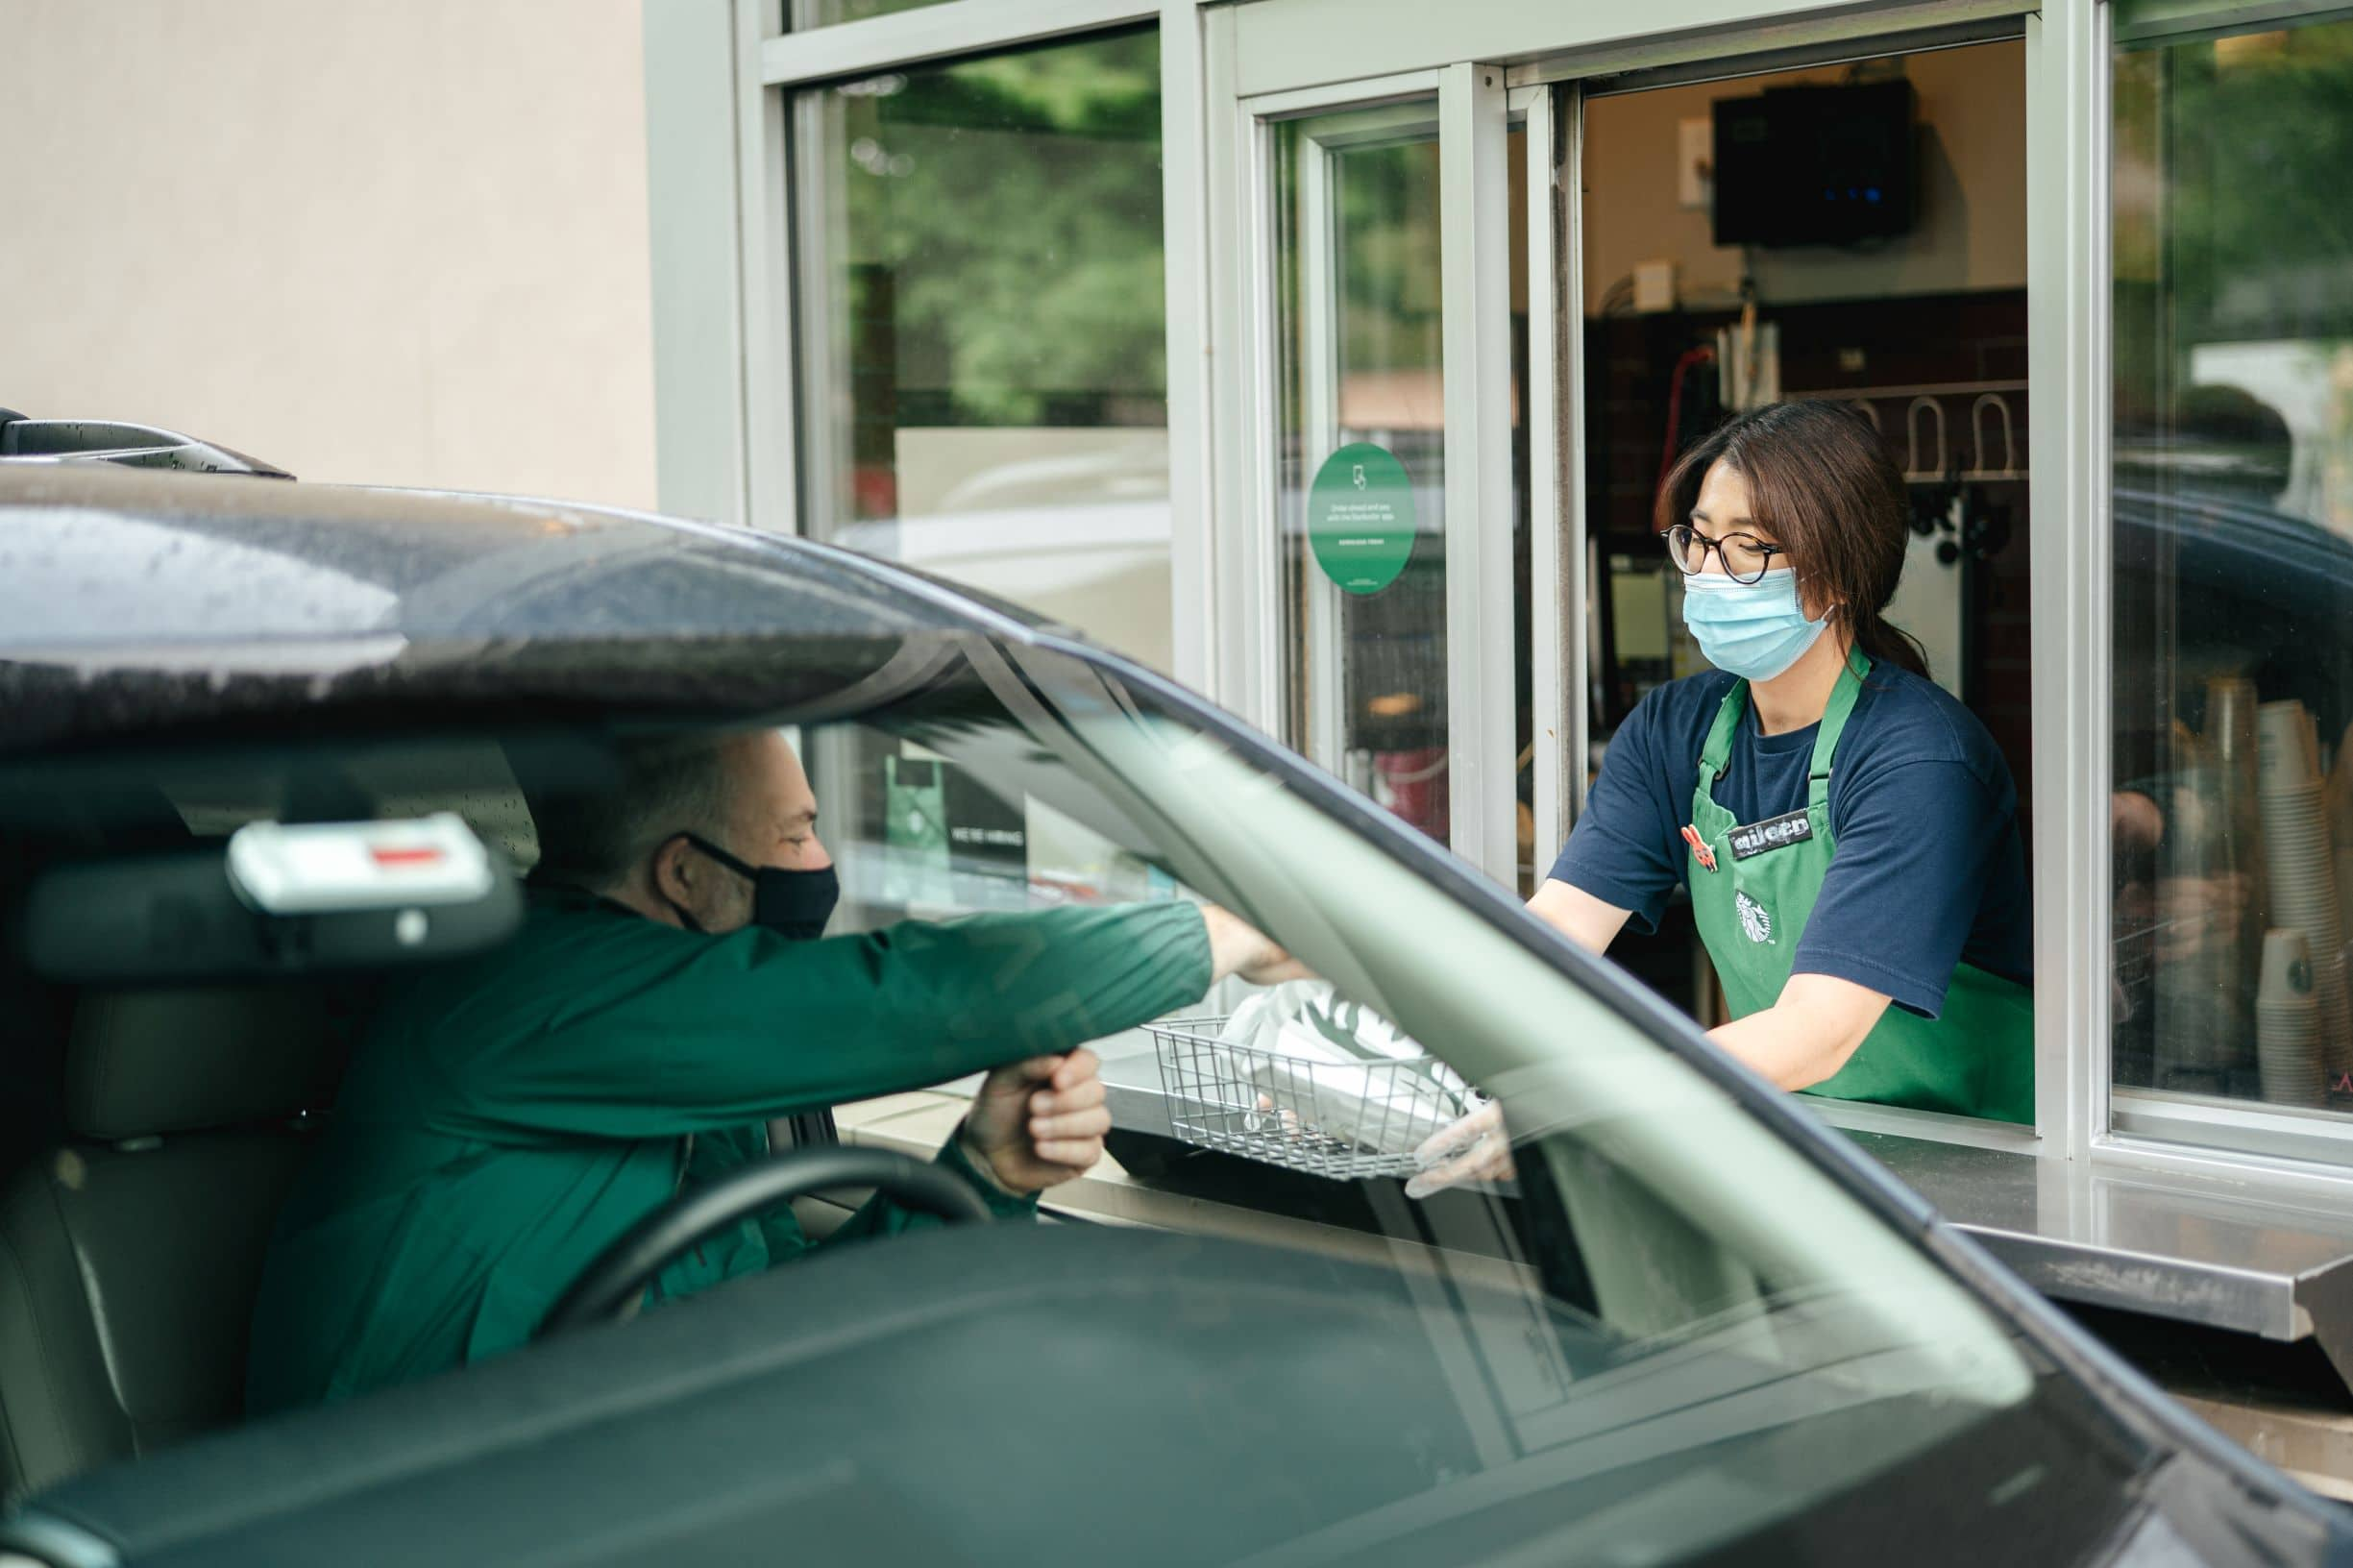 Starbucks drive-thru facemasks